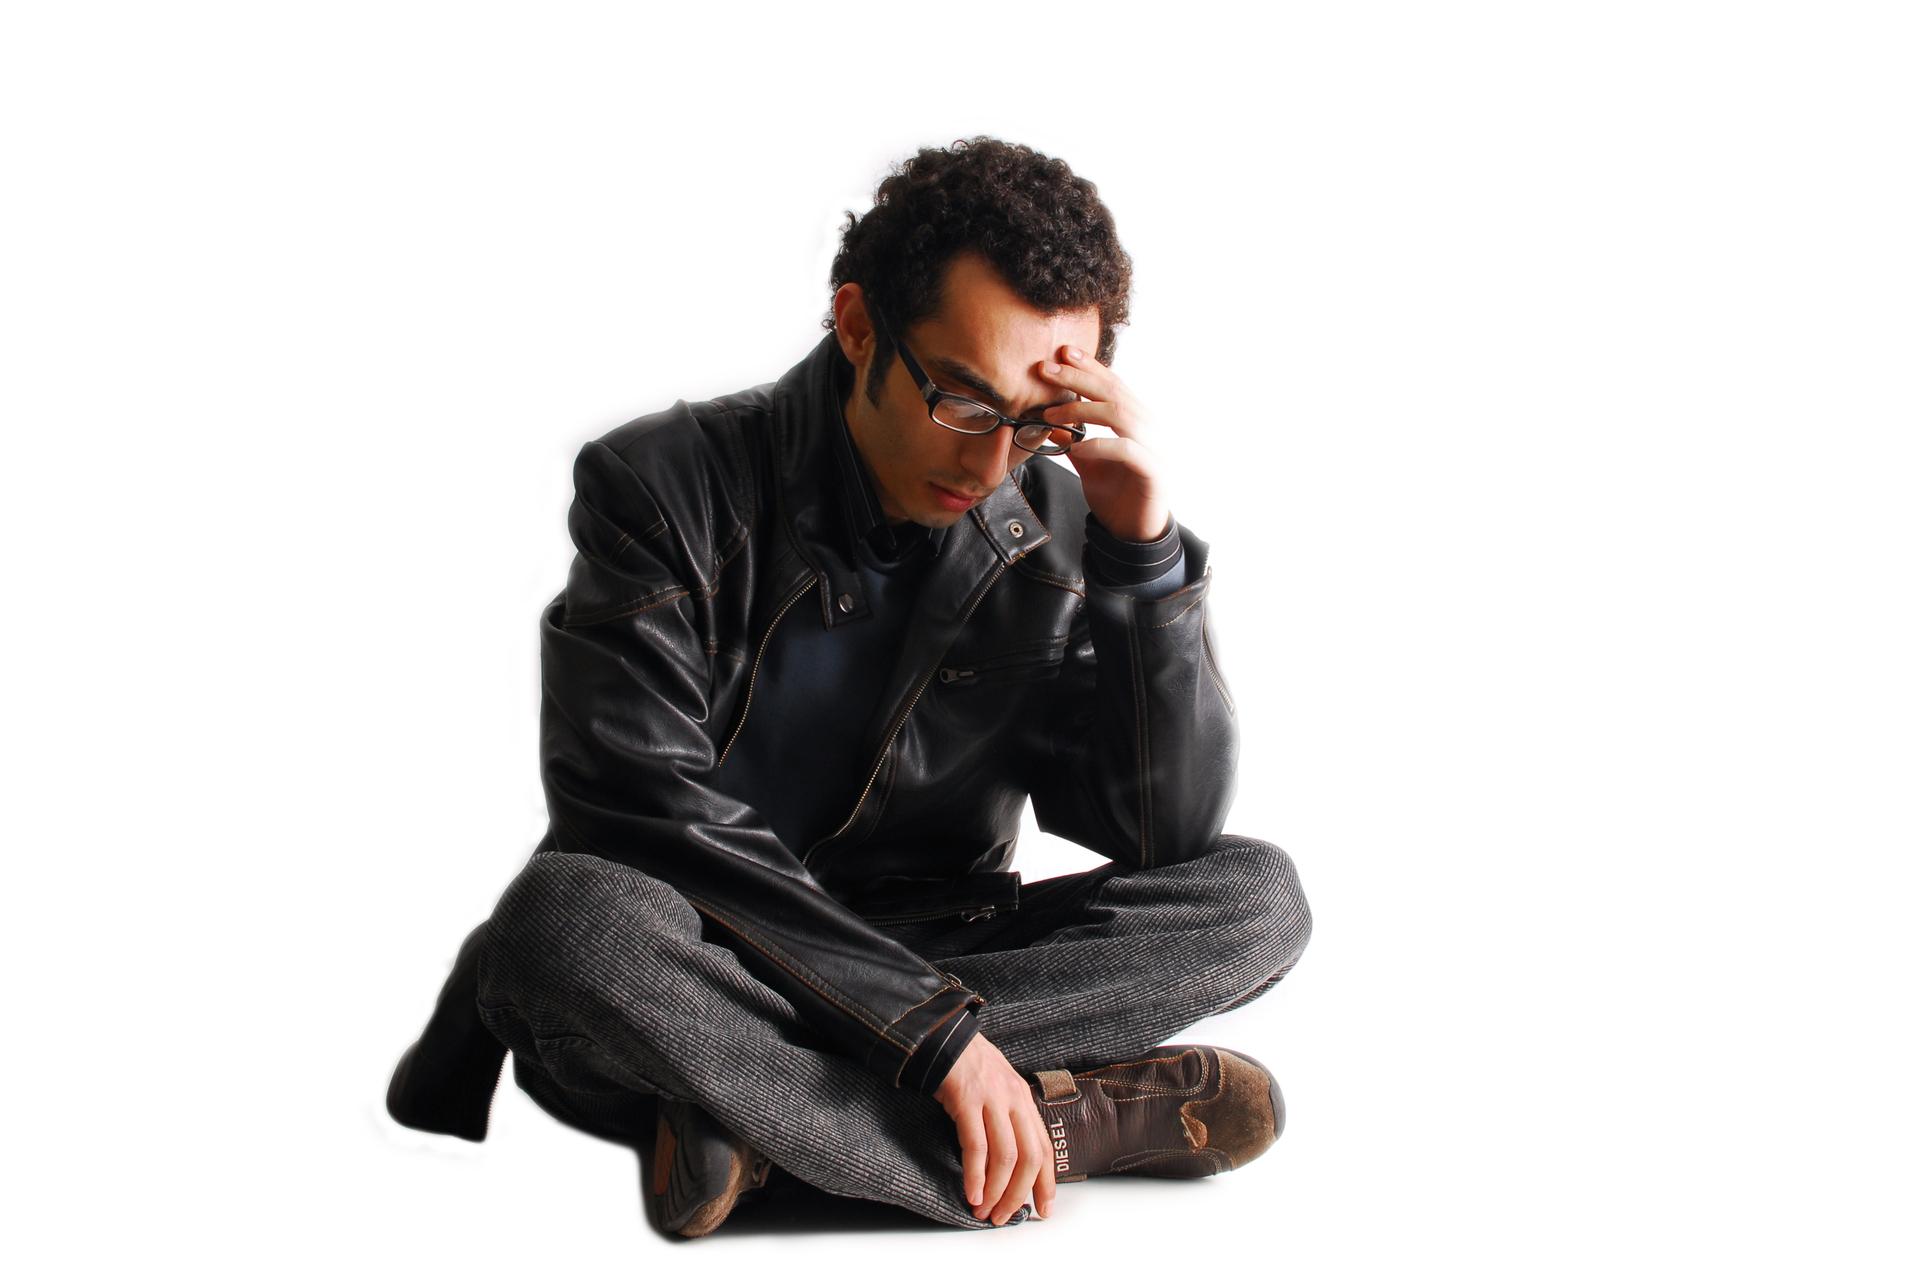 depressed man-against-white-free-photos-1430353-1919x1284 copy.jpg